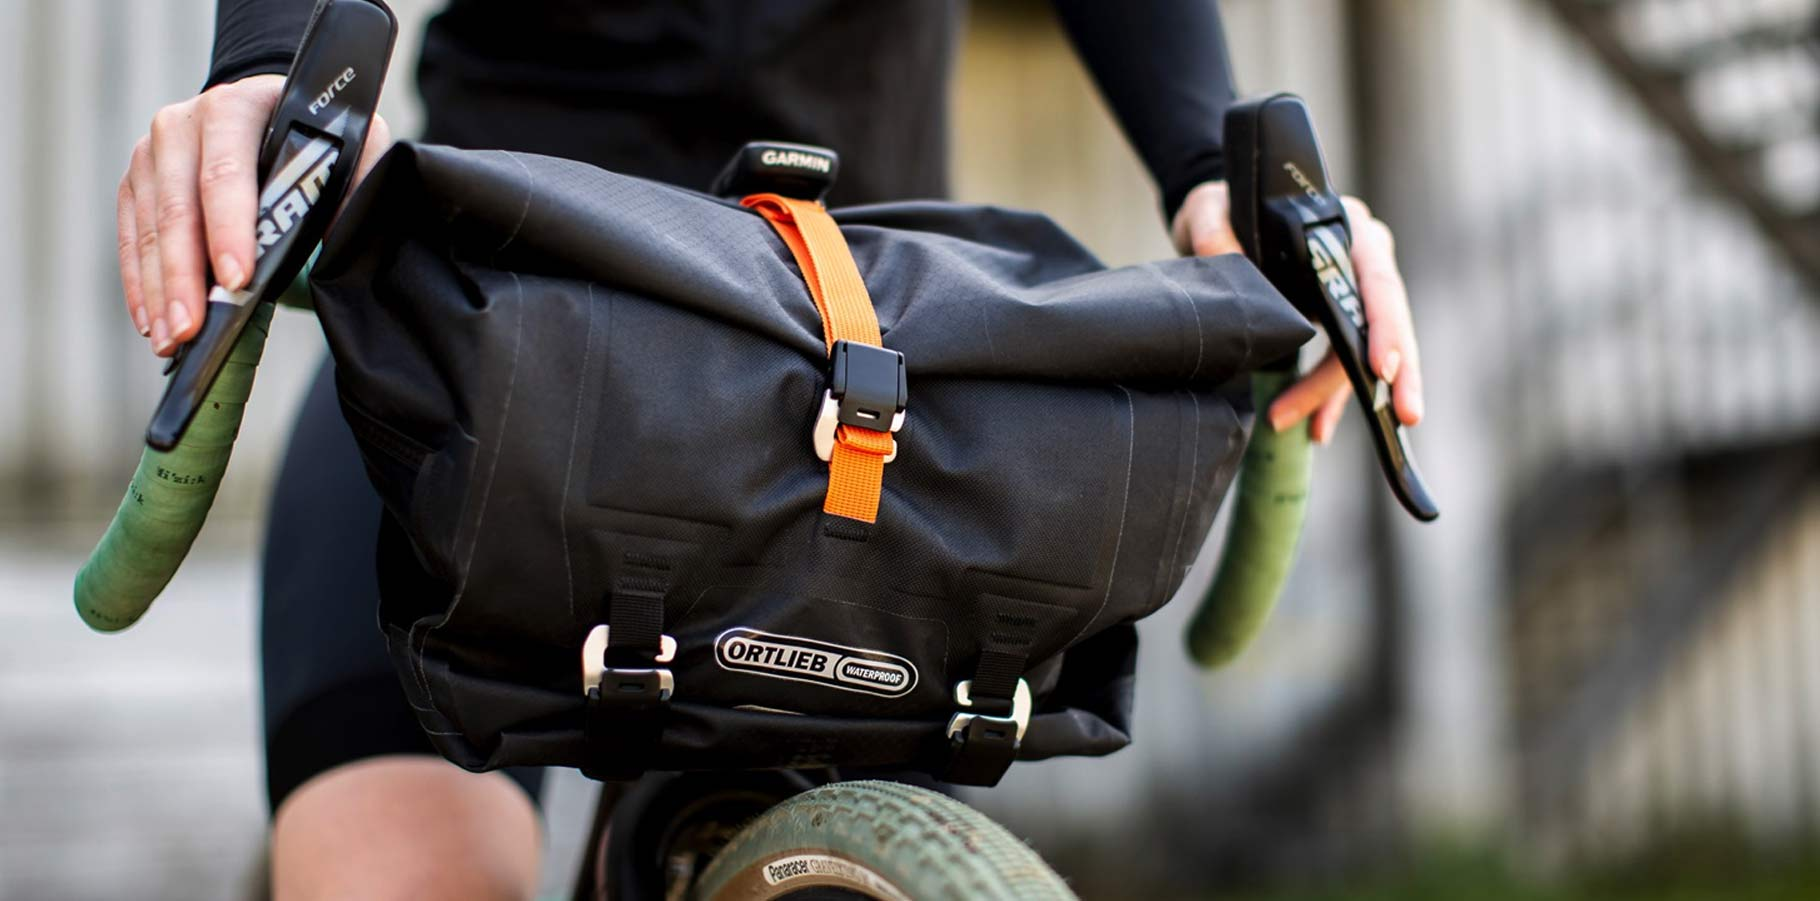 Ortlieb-Handlebar-pack-QR-1